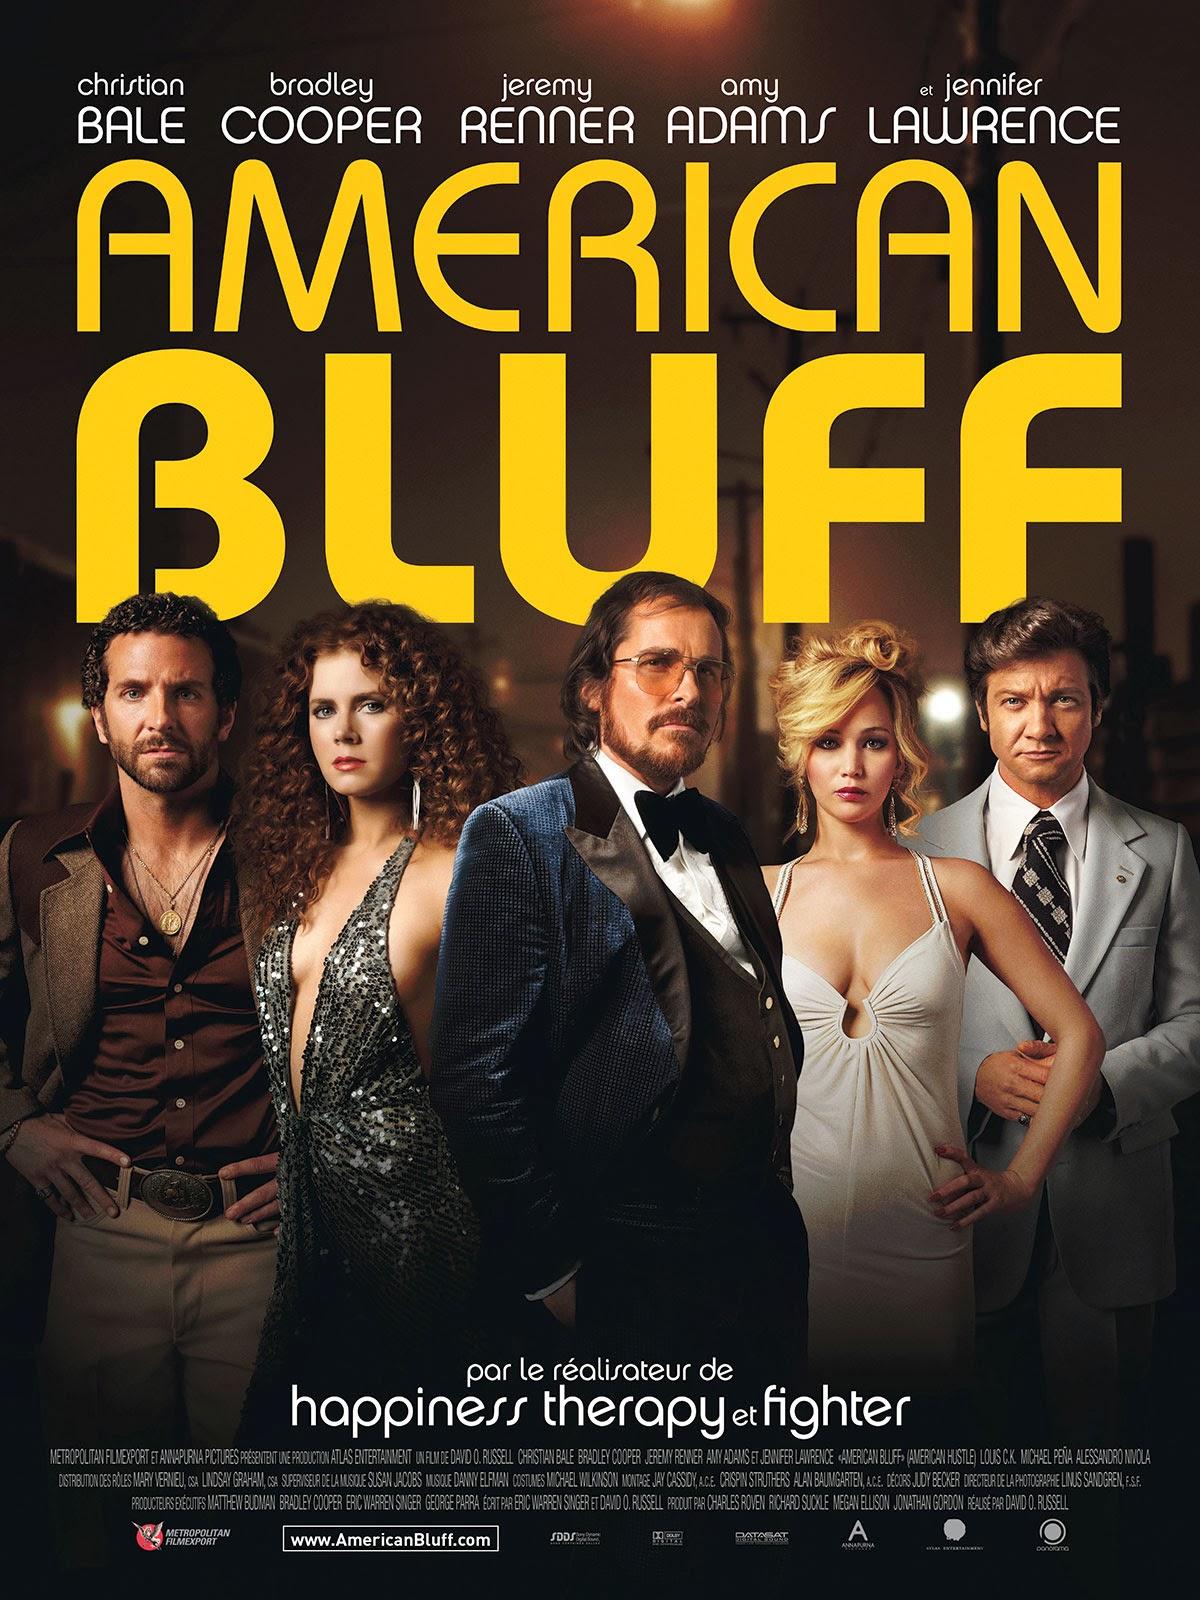 http://fuckingcinephiles.blogspot.fr/2014/02/critique-american-bluff.html